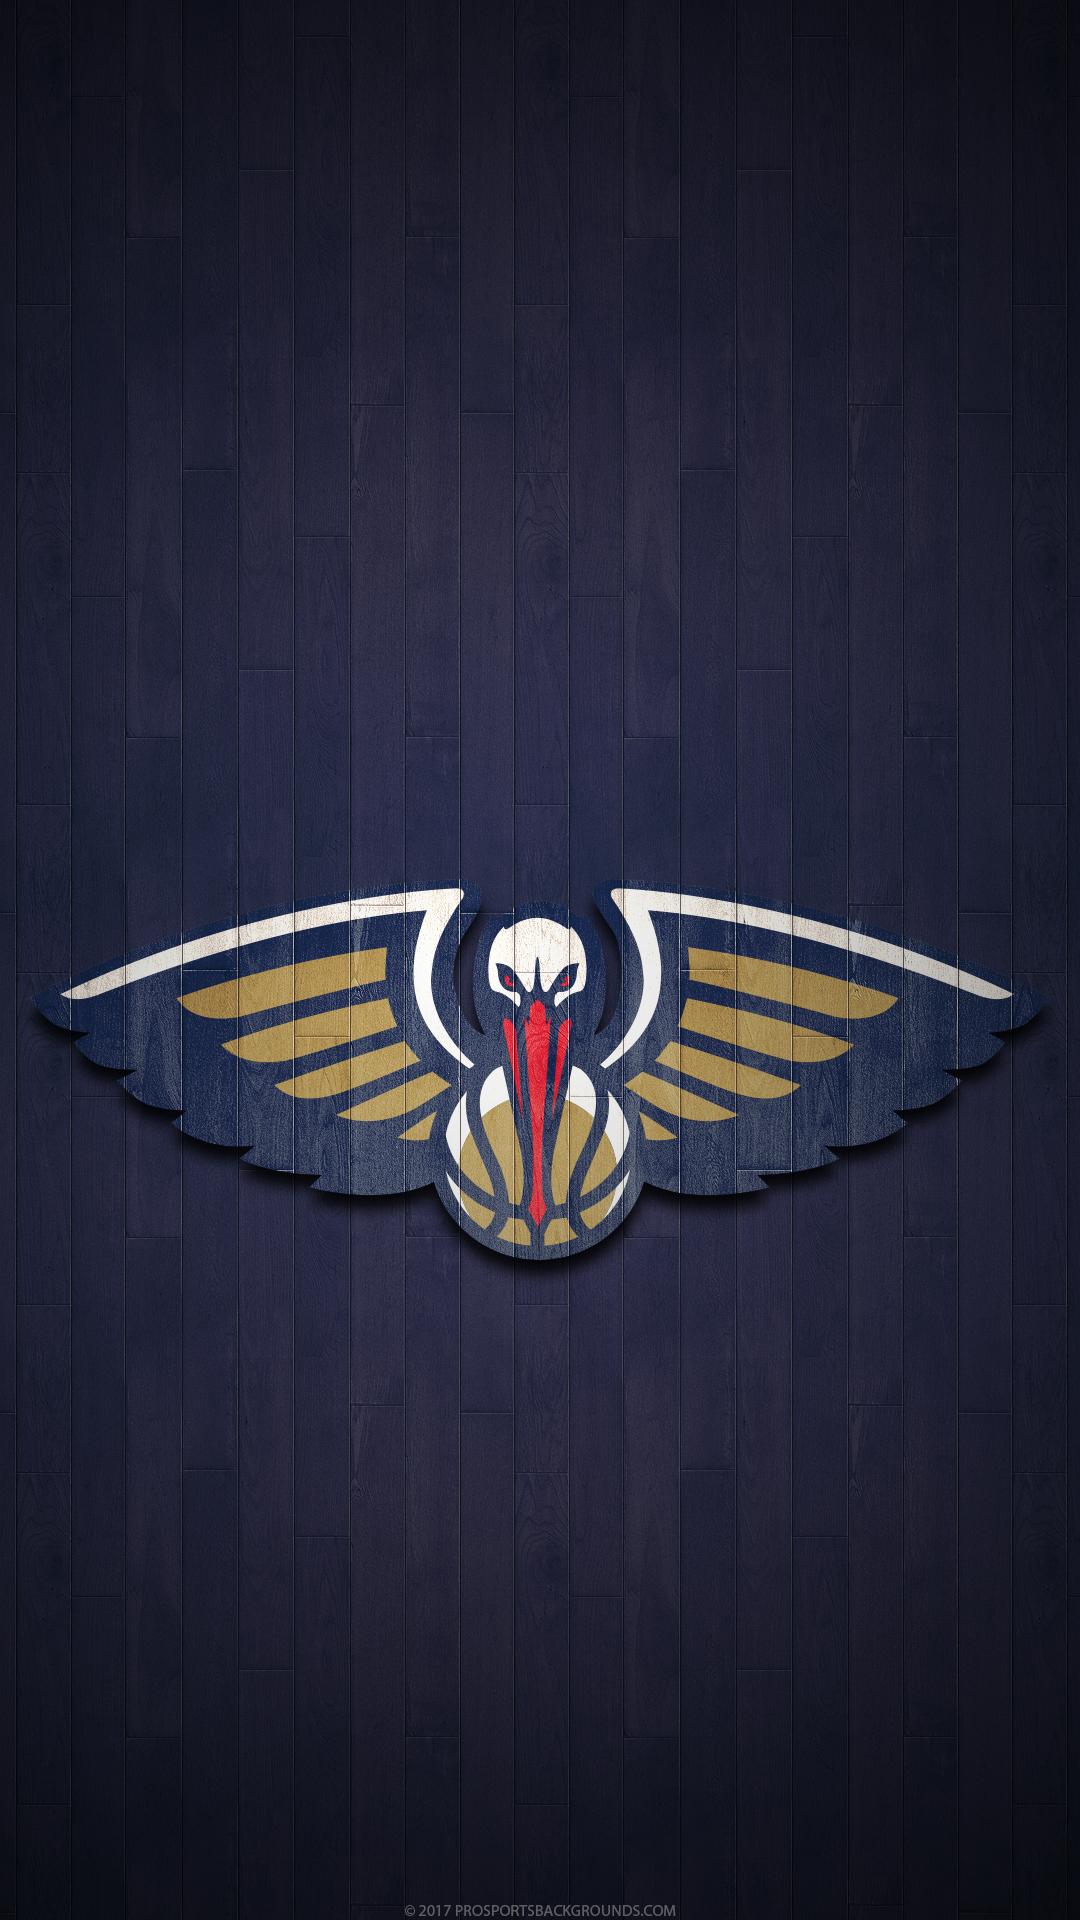 Sports New Orleans Pelicans 1080x1920 Wallpaper Id 763006